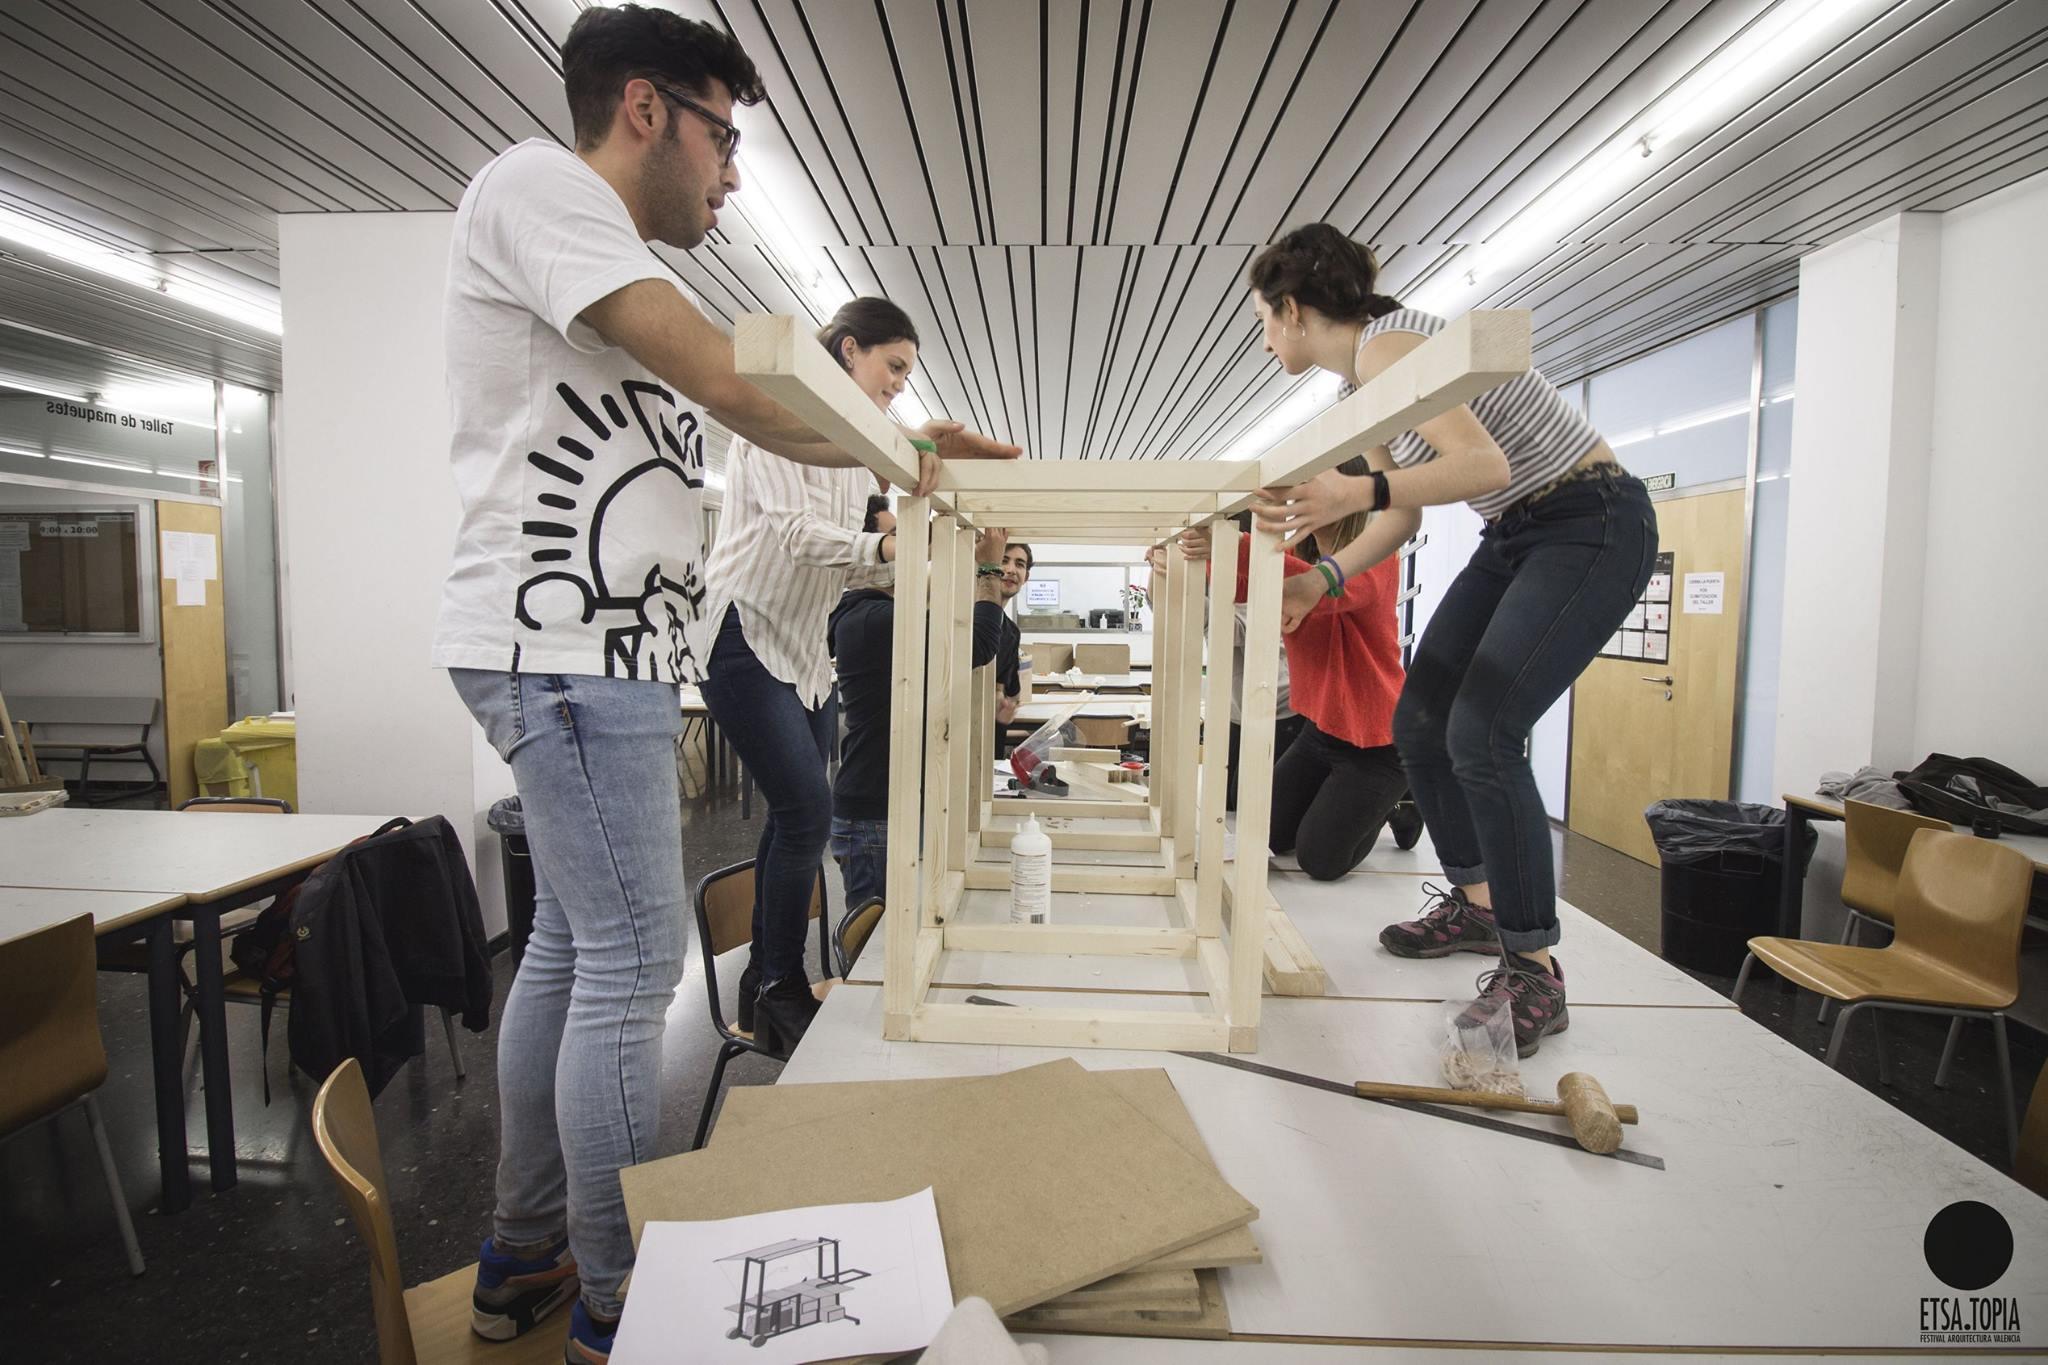 valencia fashion blogger spain somethingfashion ETSA UPV architecture school festivalETSATOPIA10